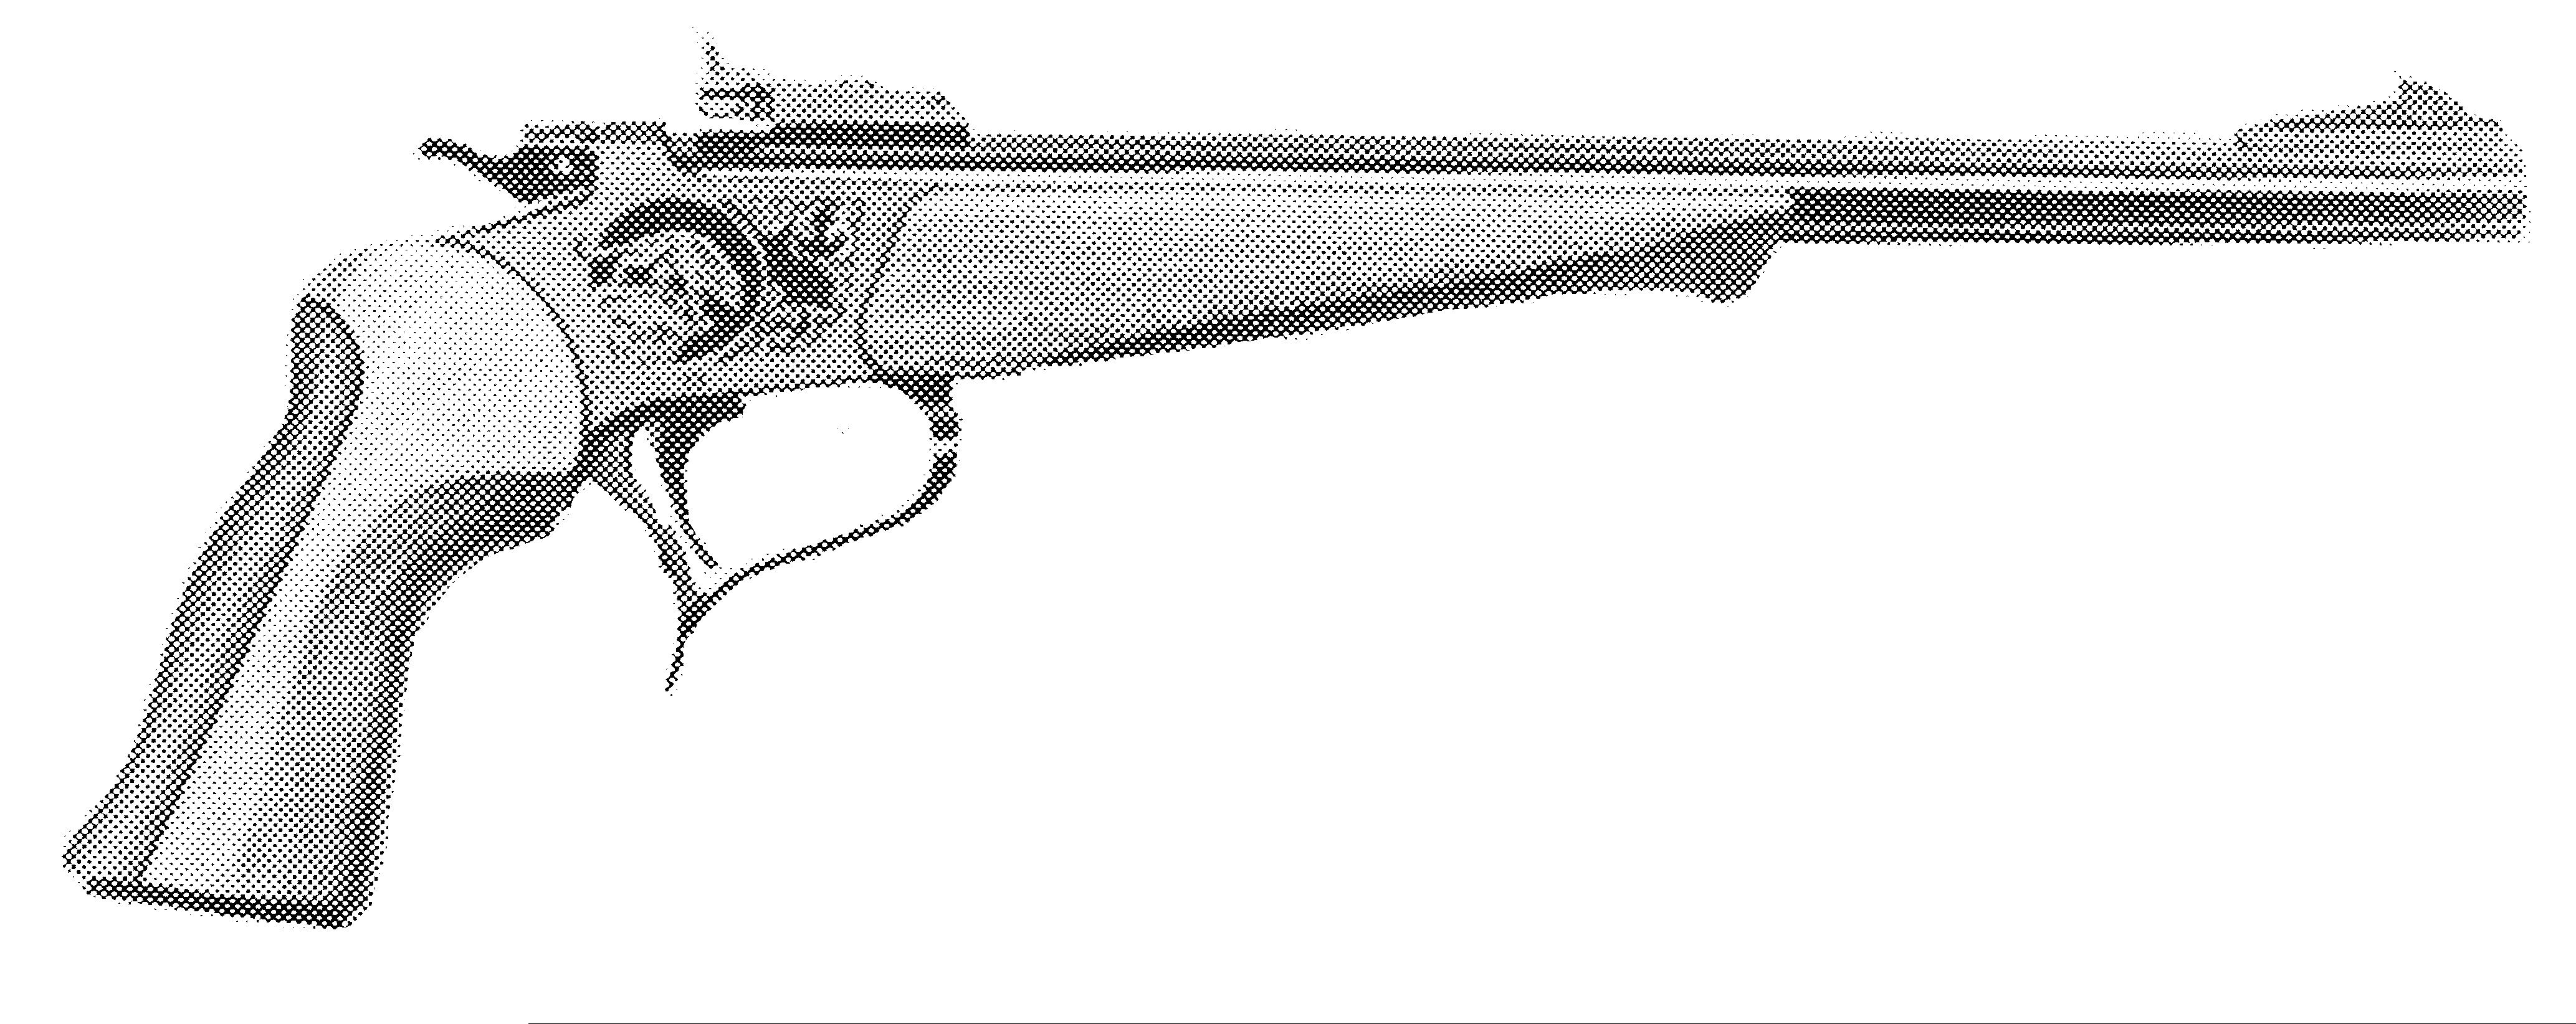 Thompson Rear Sight